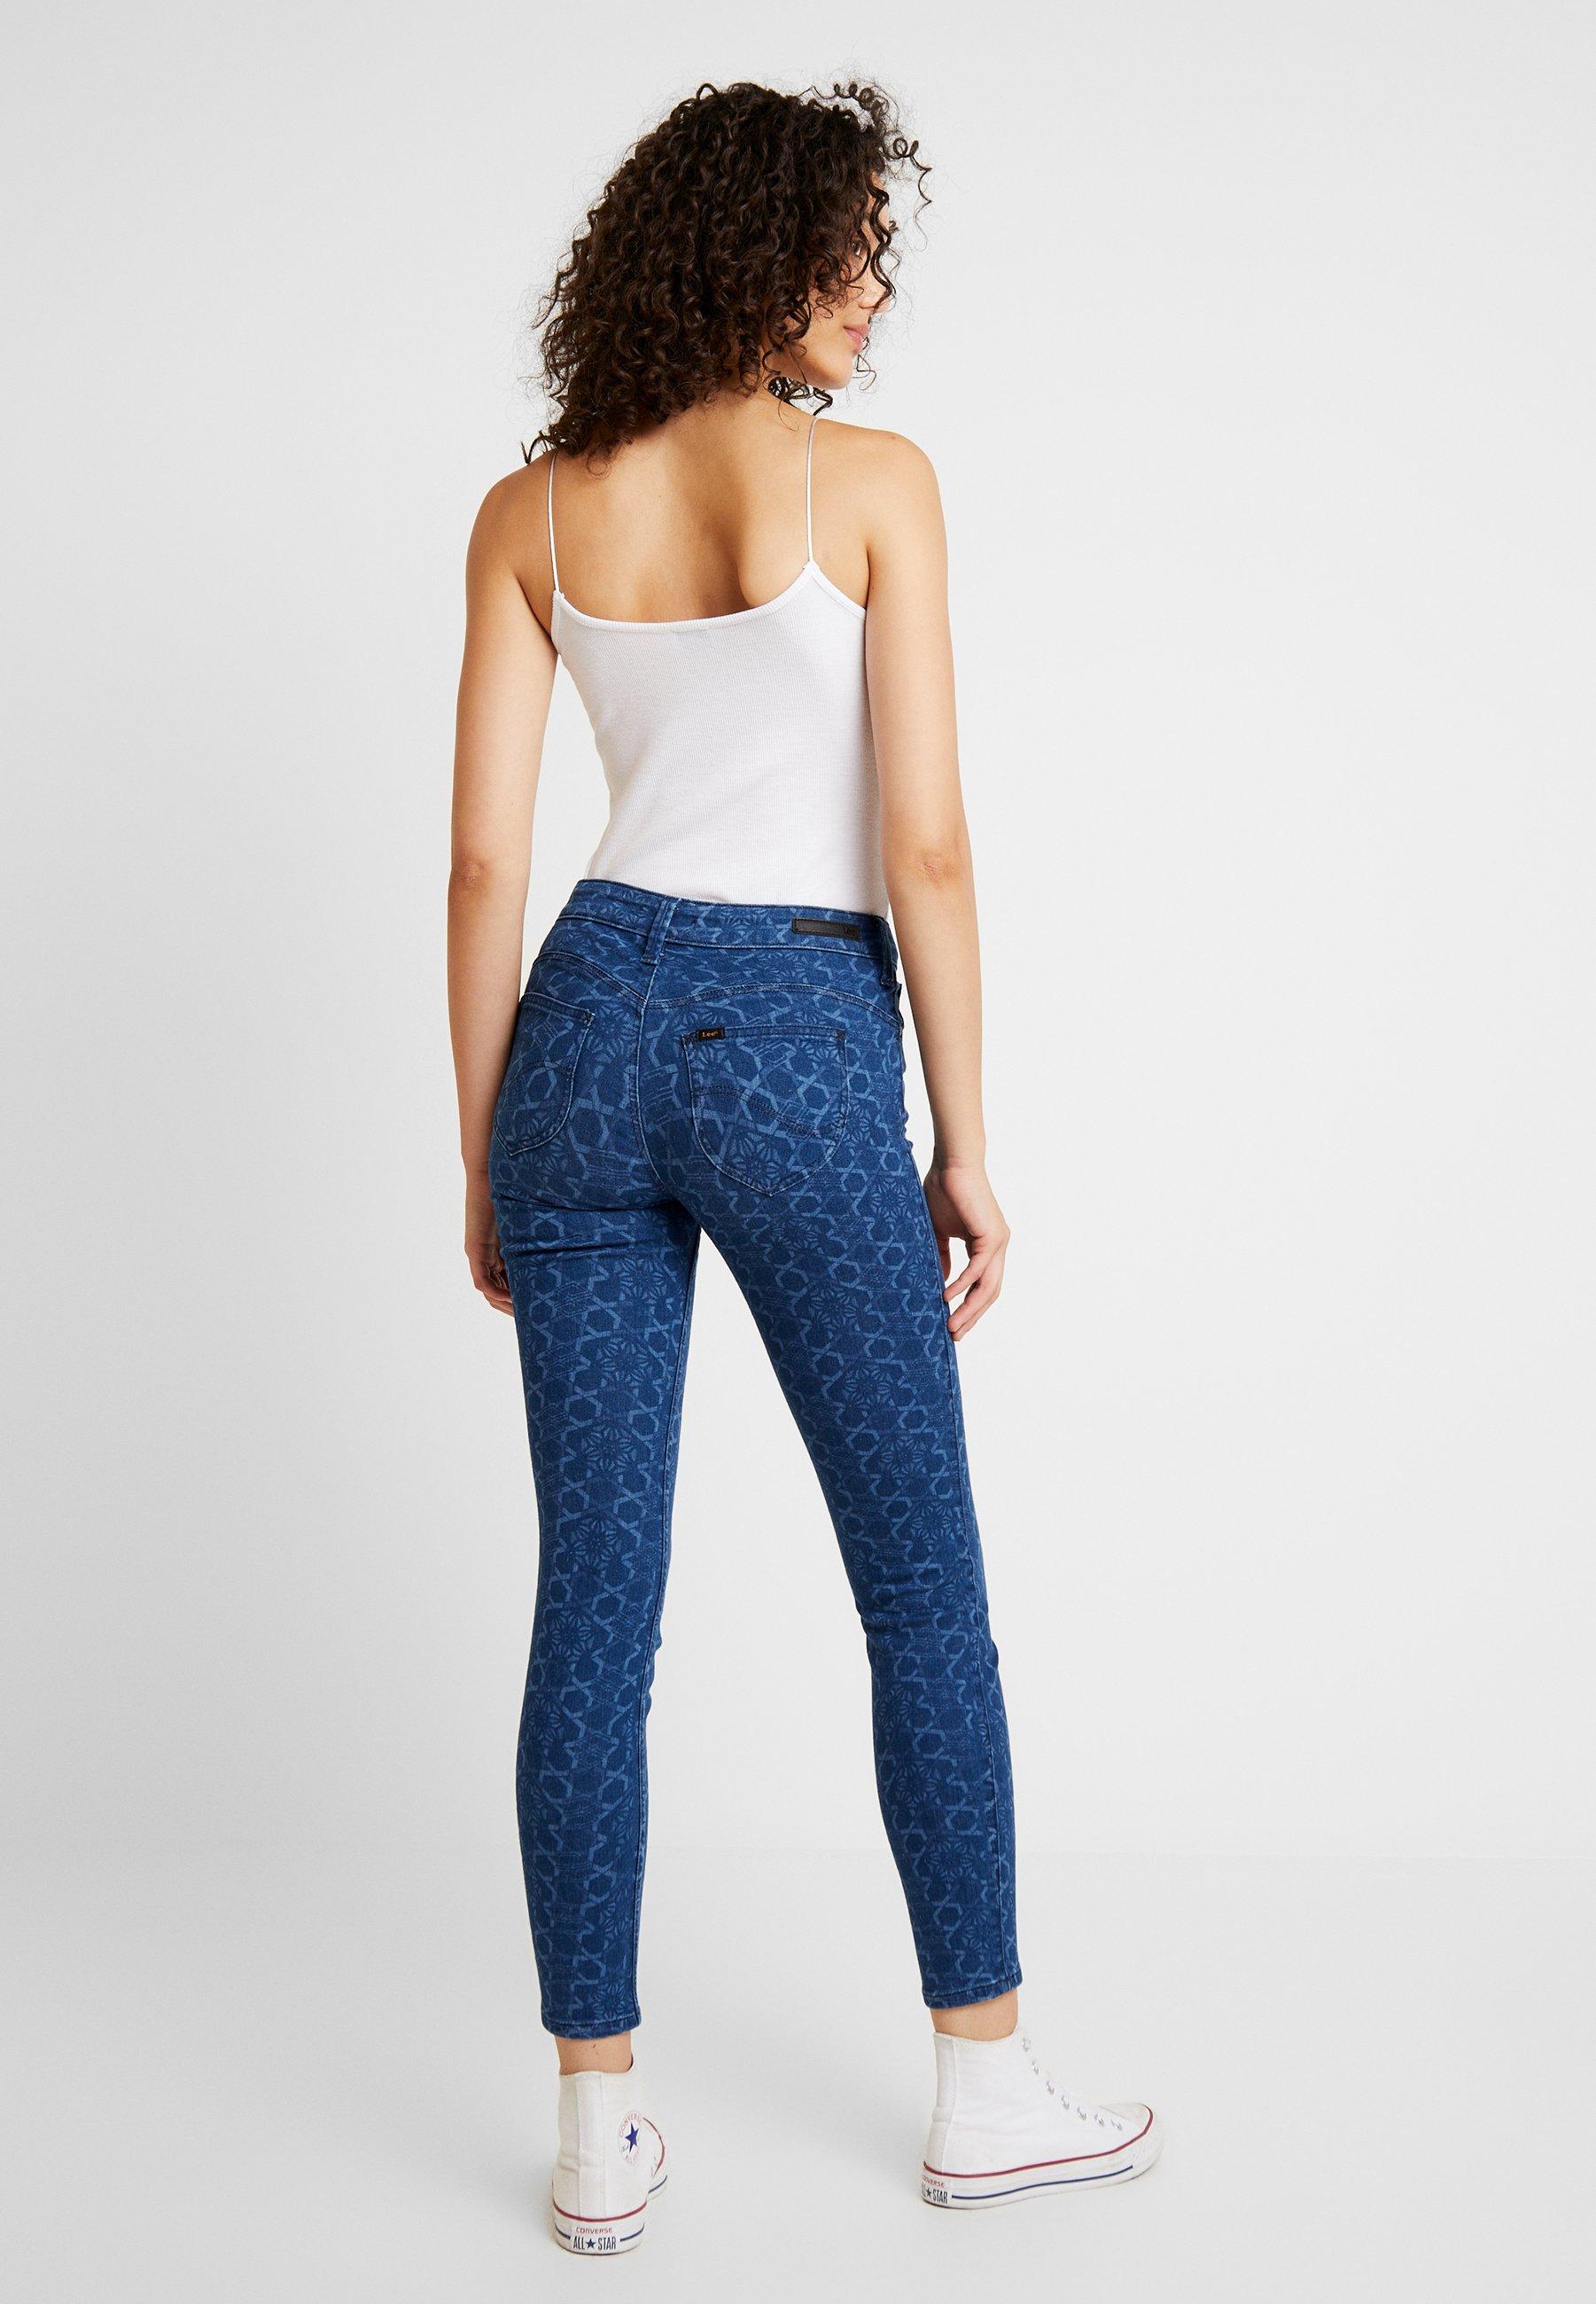 Body Denim Skinny Lee Scarlett OptixJeans Blue Yf6gyb7v